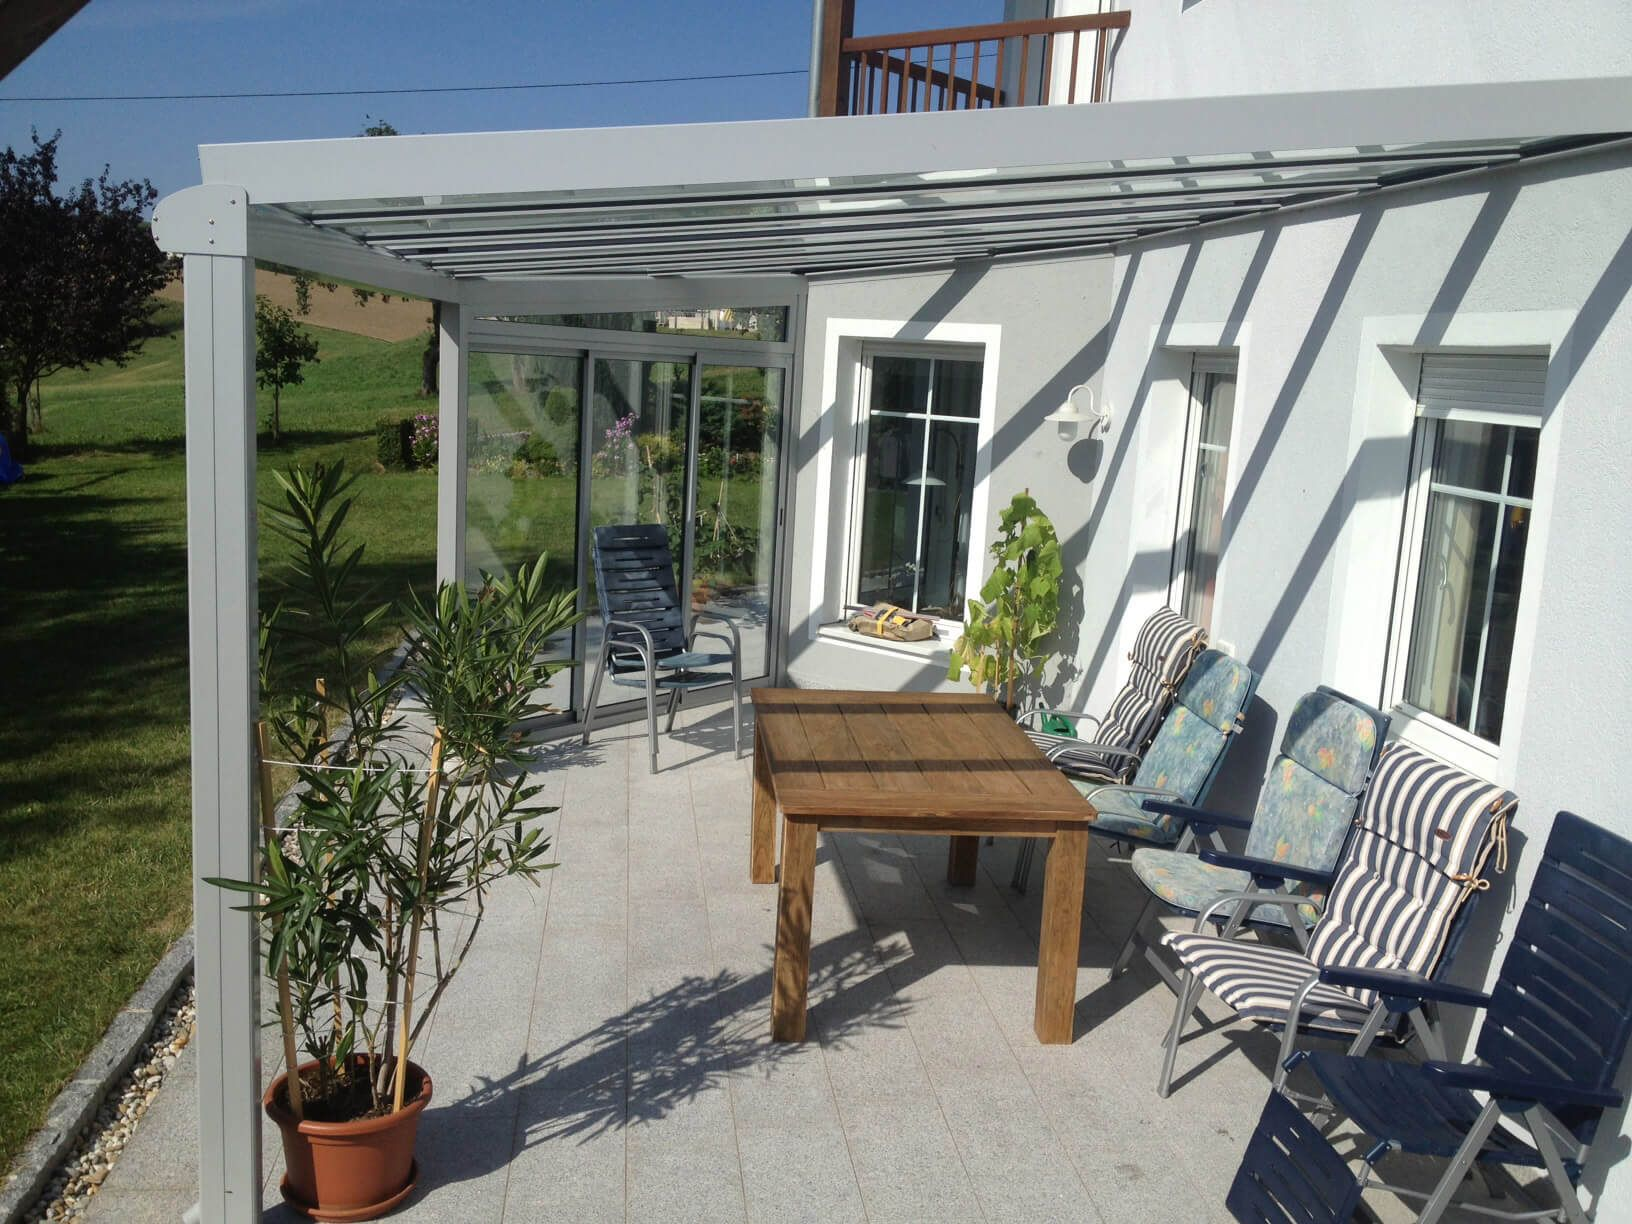 markise seitenwand terrasse construire une pergola couverte luxe plan pergola bois. Black Bedroom Furniture Sets. Home Design Ideas